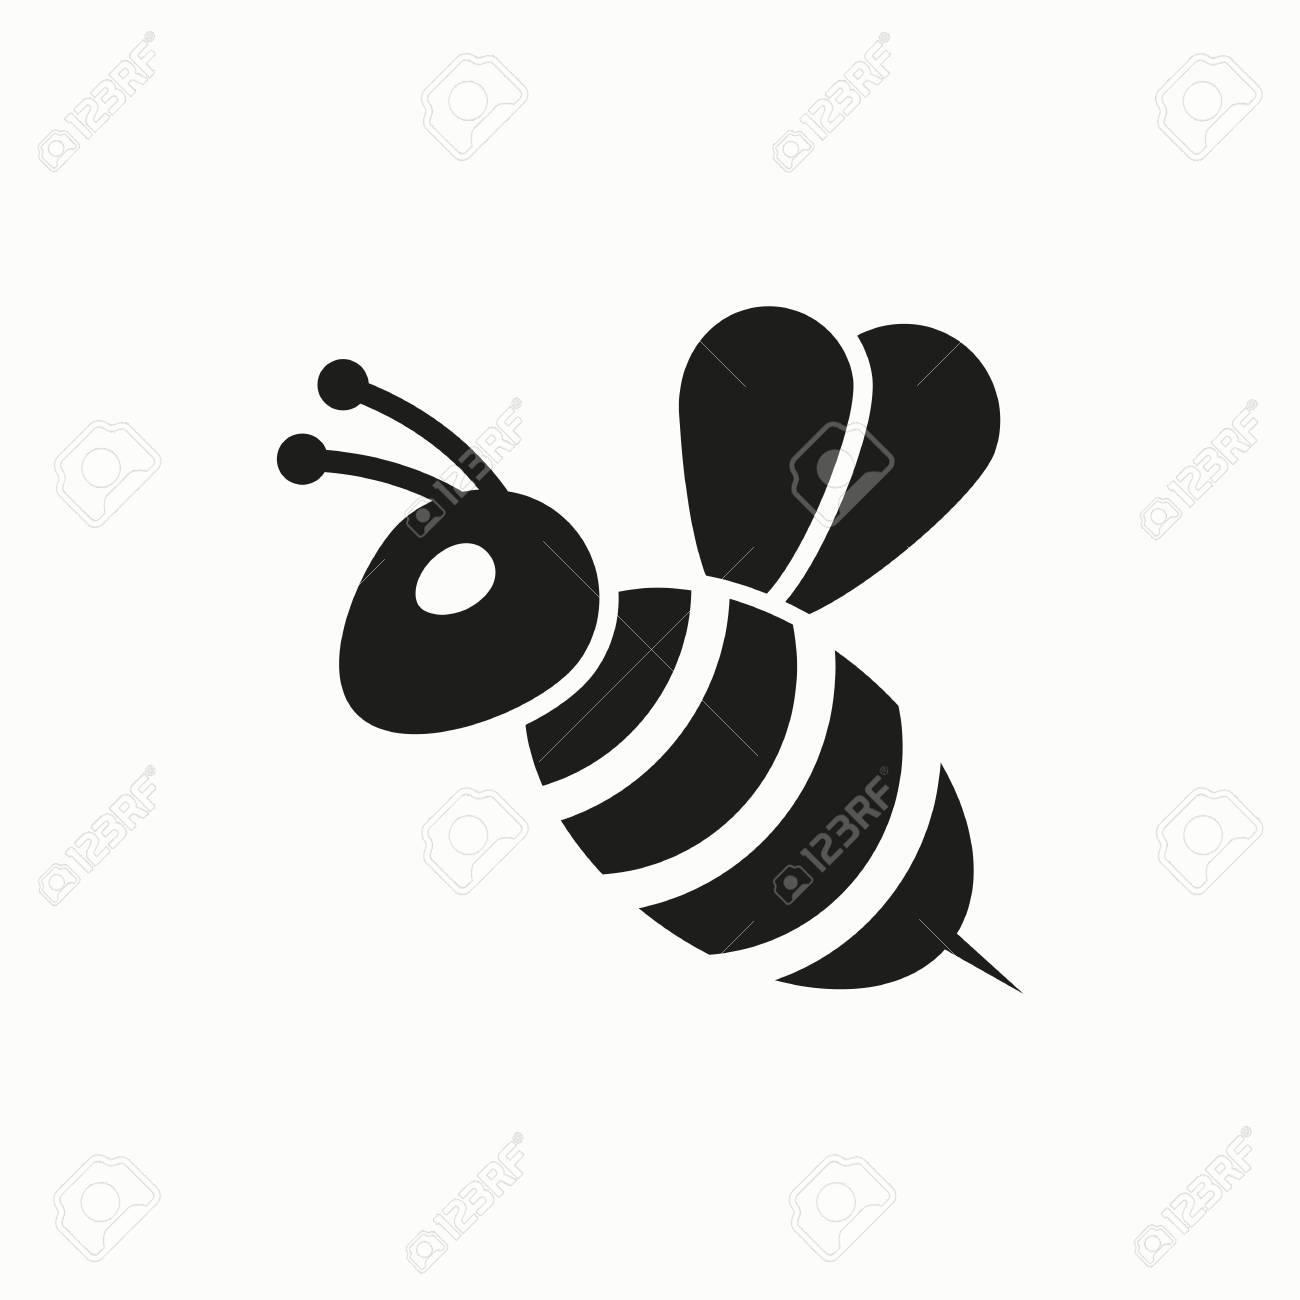 Bee flat design illustration. Simple vector icon. - 114801772